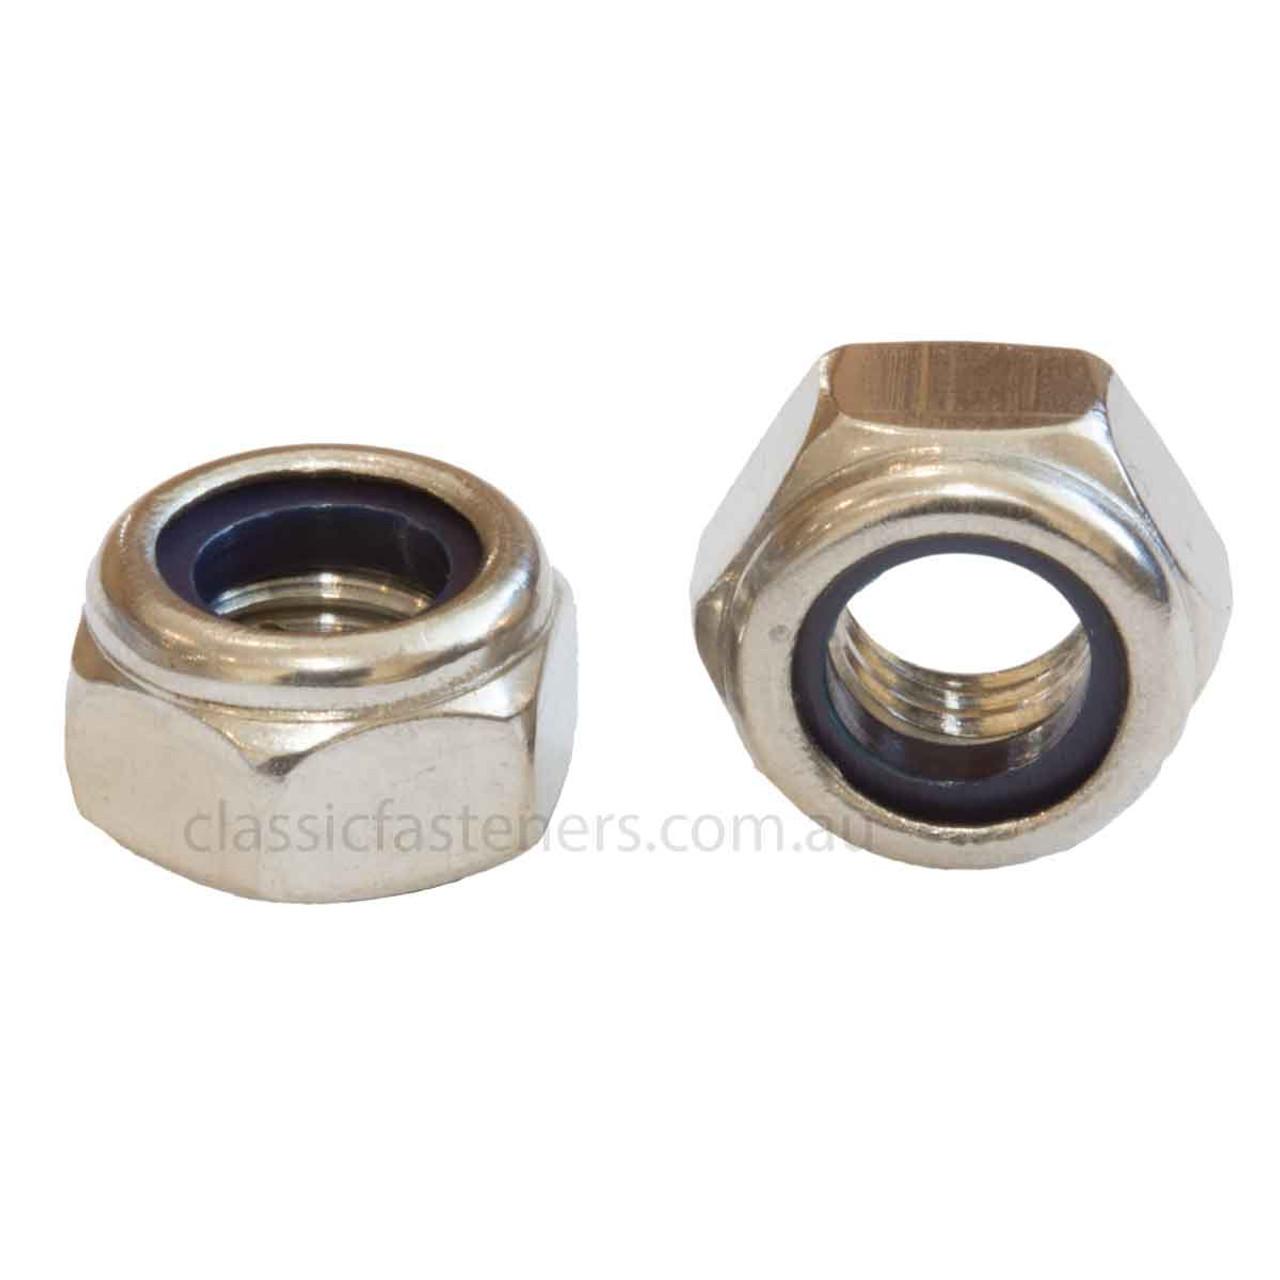 M4 Nylon insert lock nut stainless steel 316